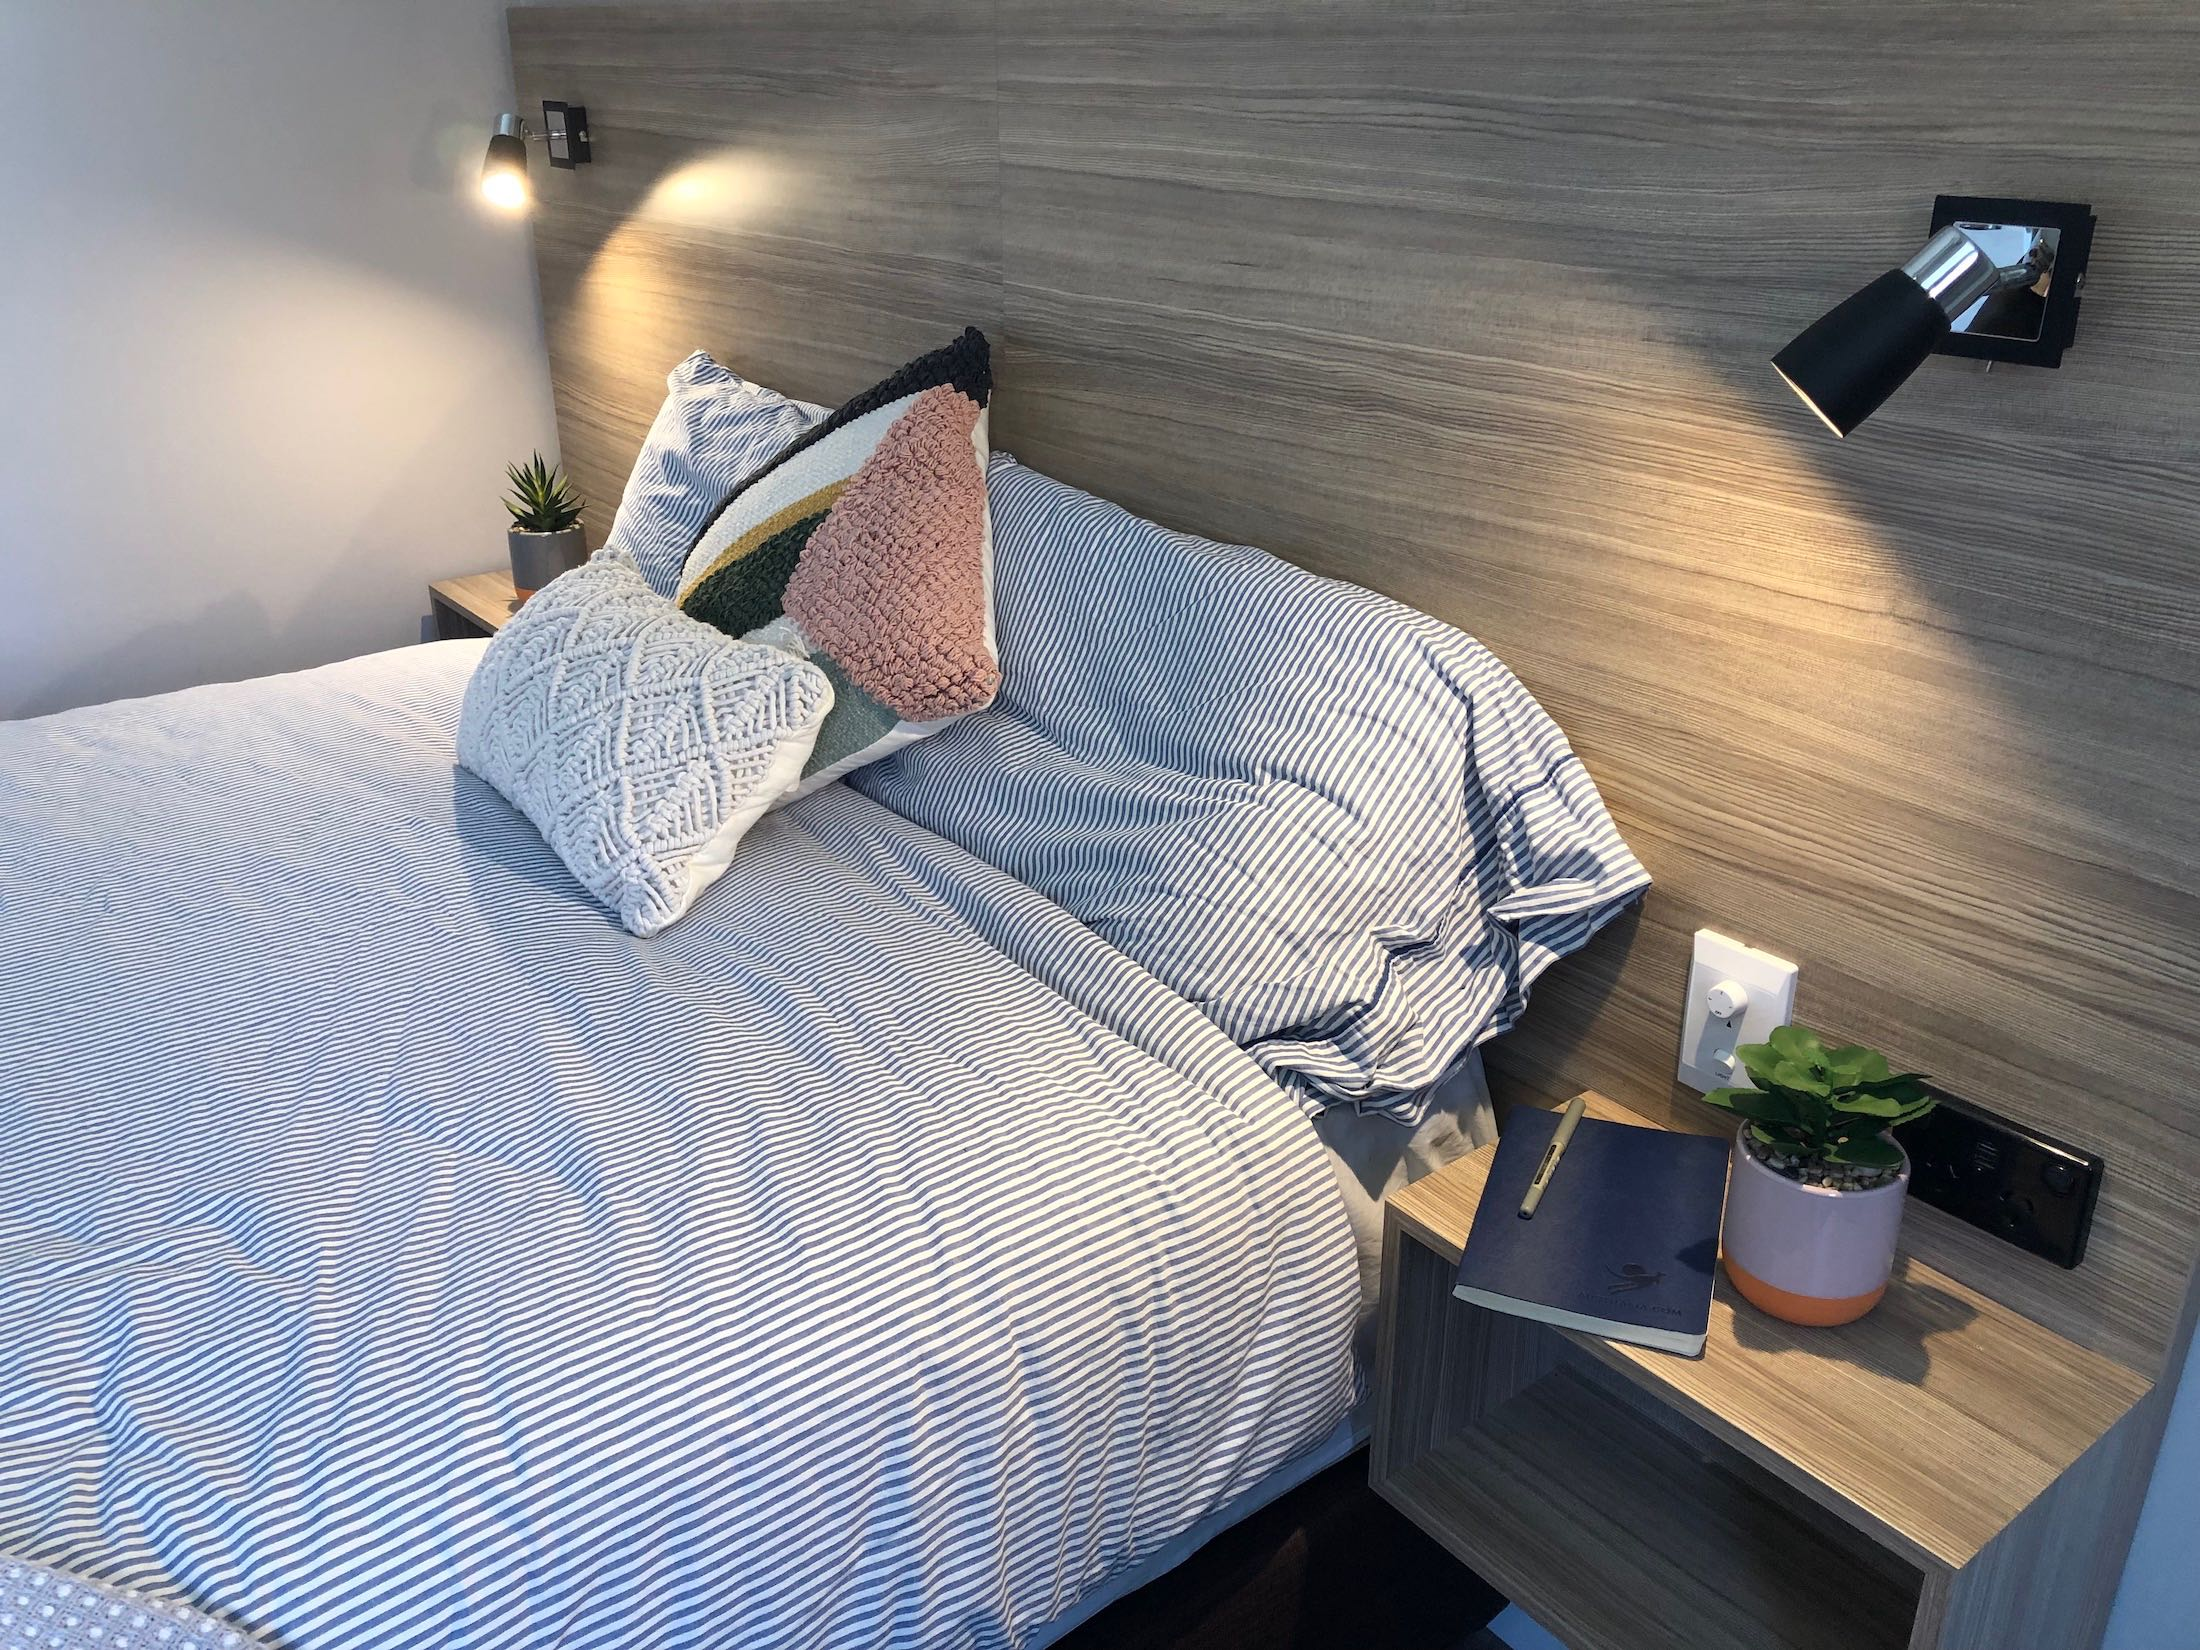 carnarvon-lodge-kirribilli-sydney-accommodation-double-room17